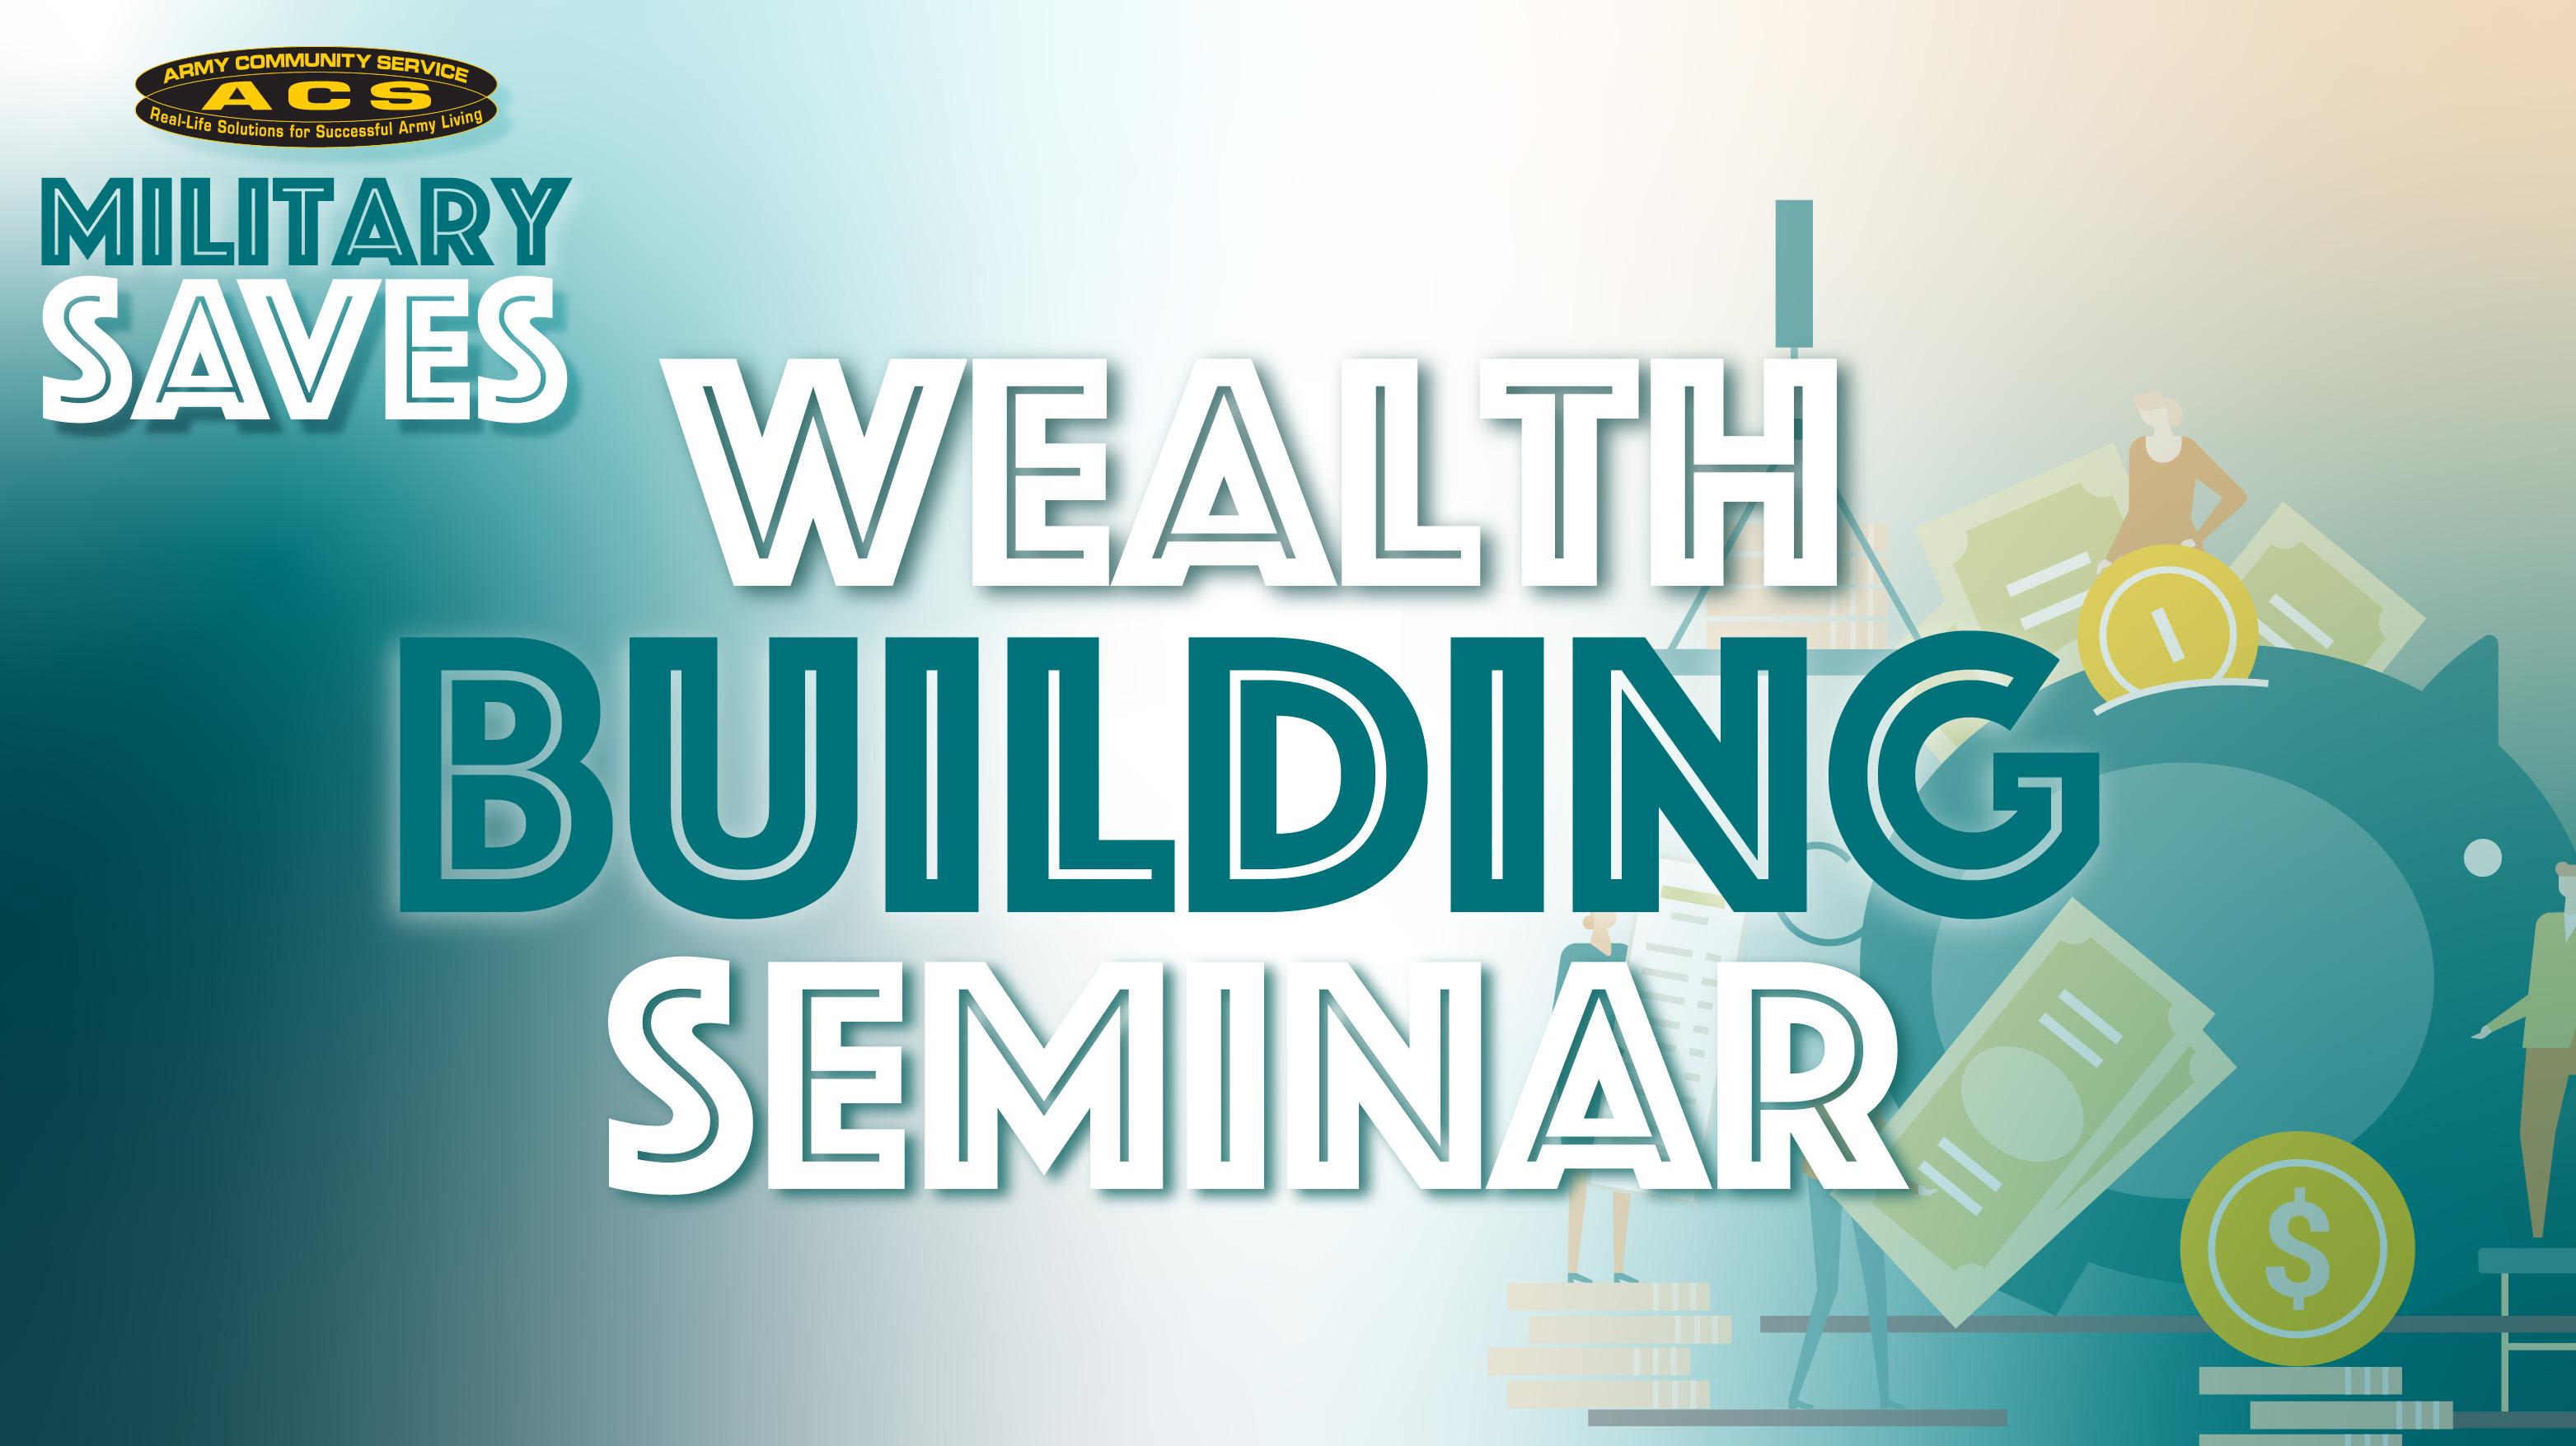 Military Saves Wealth Builder Seminar